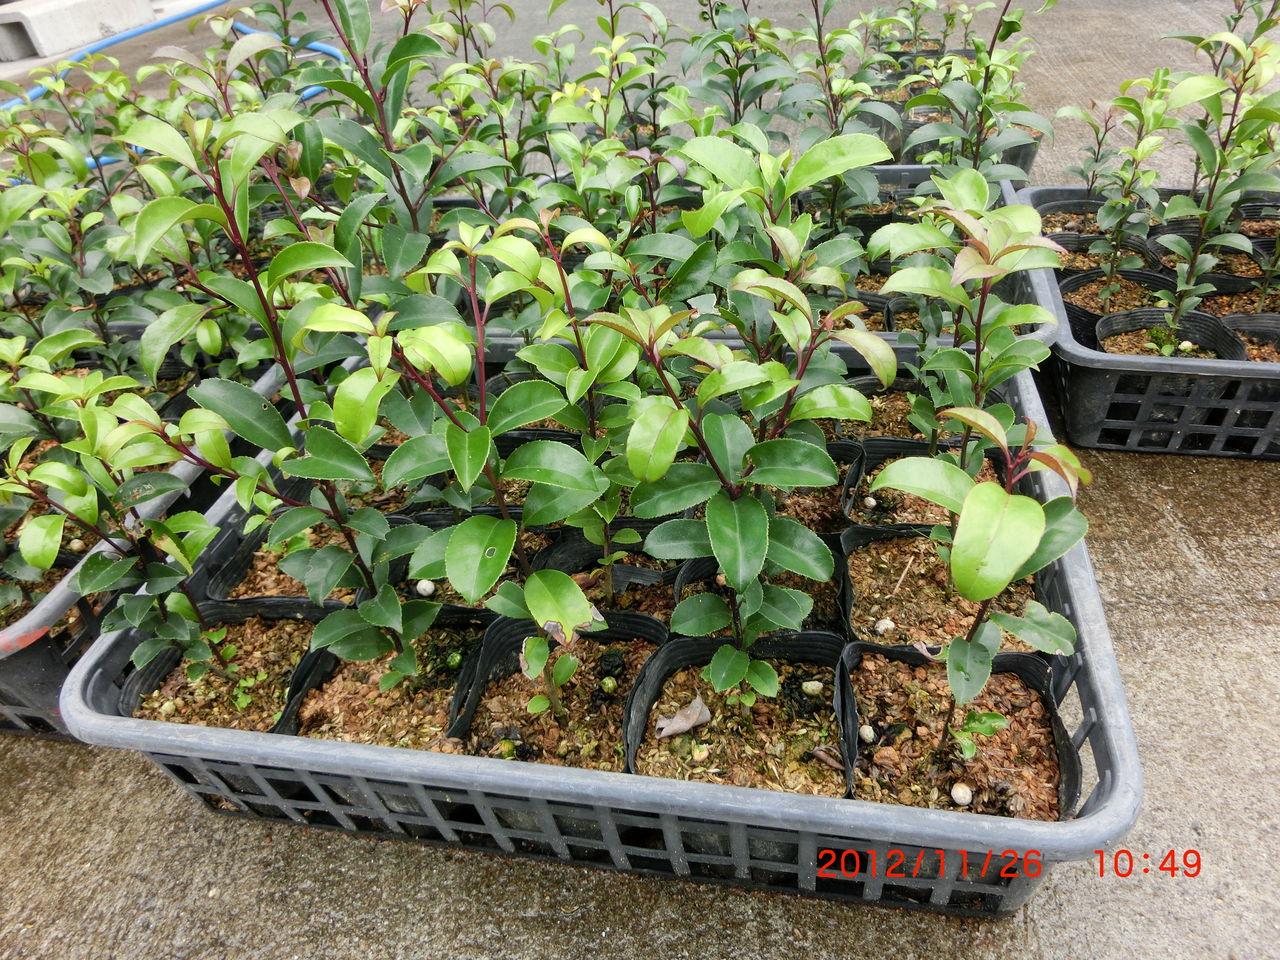 CIMG0251 吉川養蜂園のブログ : クロガネモチ 吉川養蜂園のブログ 熊本県葦北郡で養蜂を